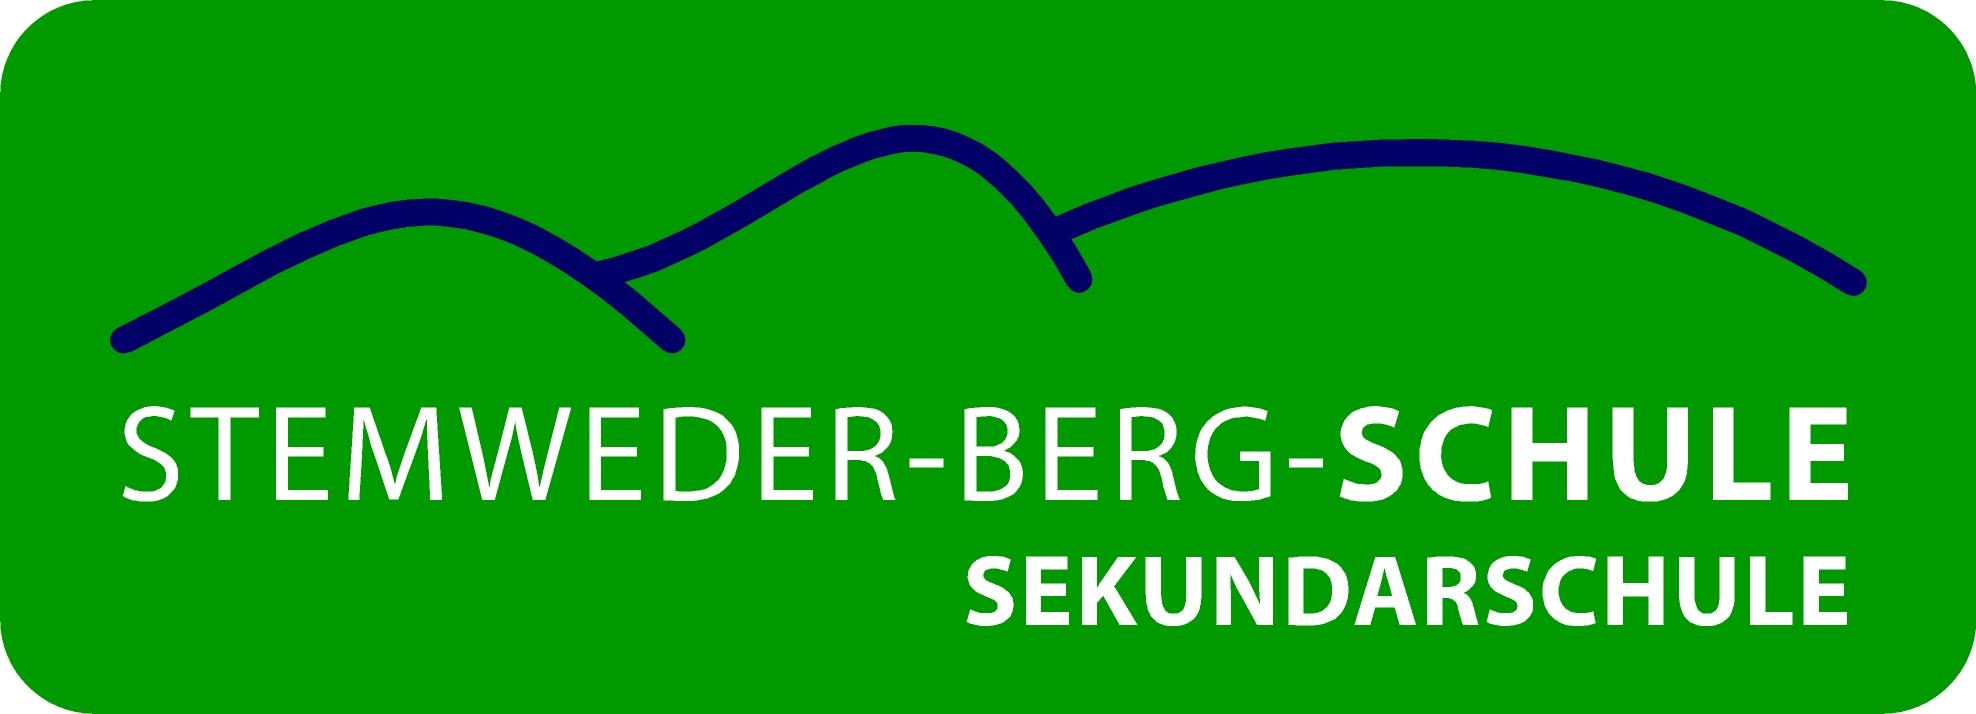 Sekundarschule Stemweder Berg